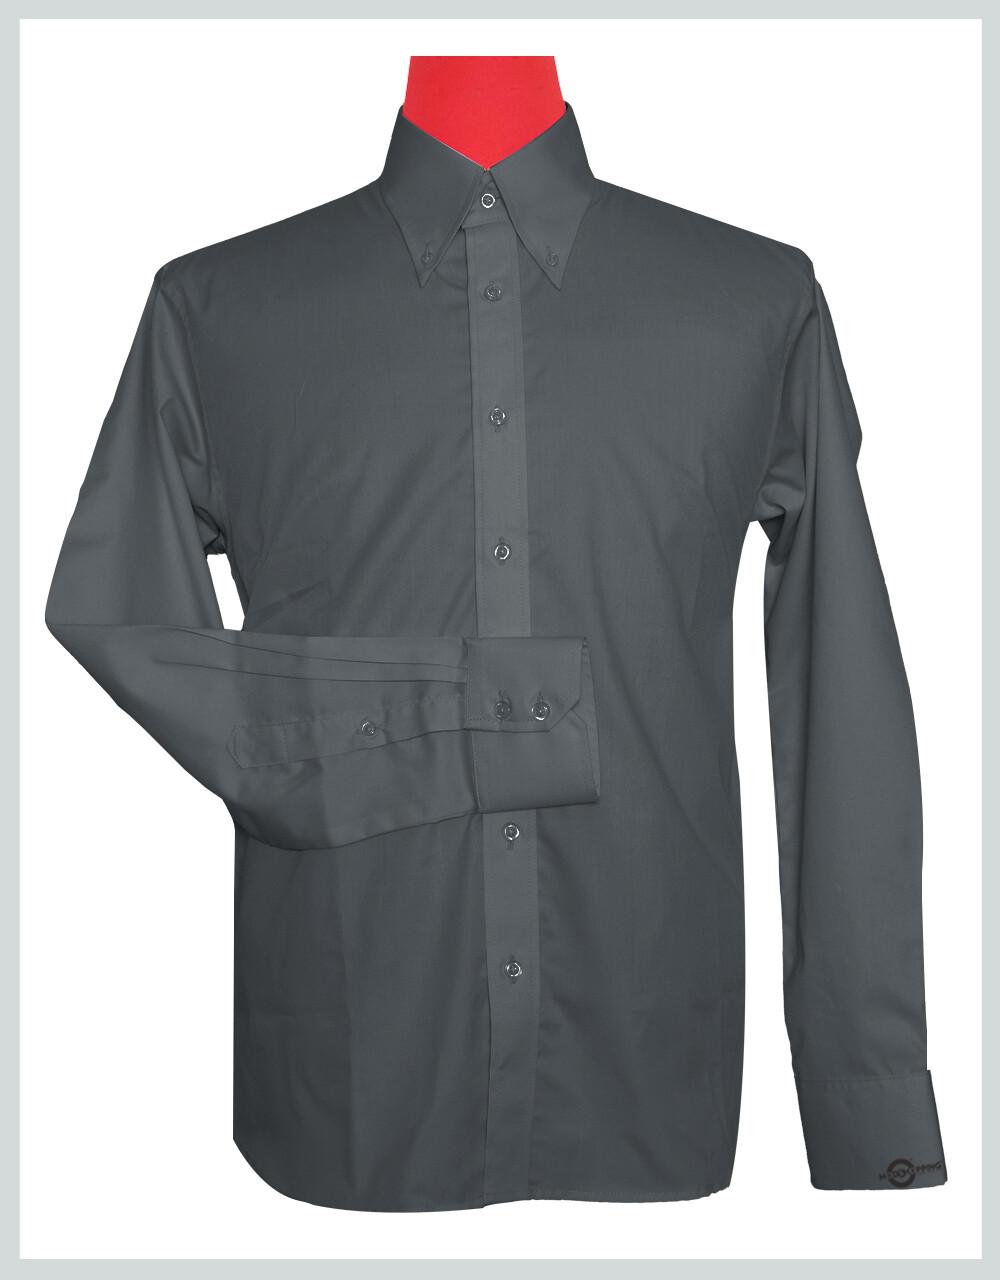 Button Down Collar Shirt | Charcoal Grey Color Shirt For Man